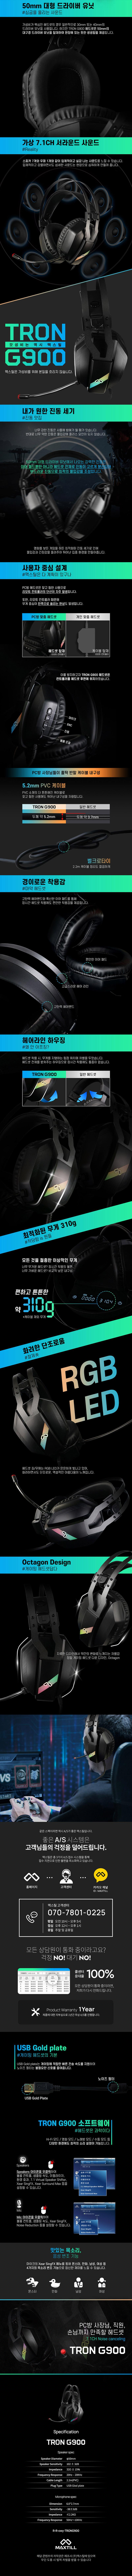 MAXTILL TRON G900 가상7.1 채널 RGB LED 게이밍 헤드셋